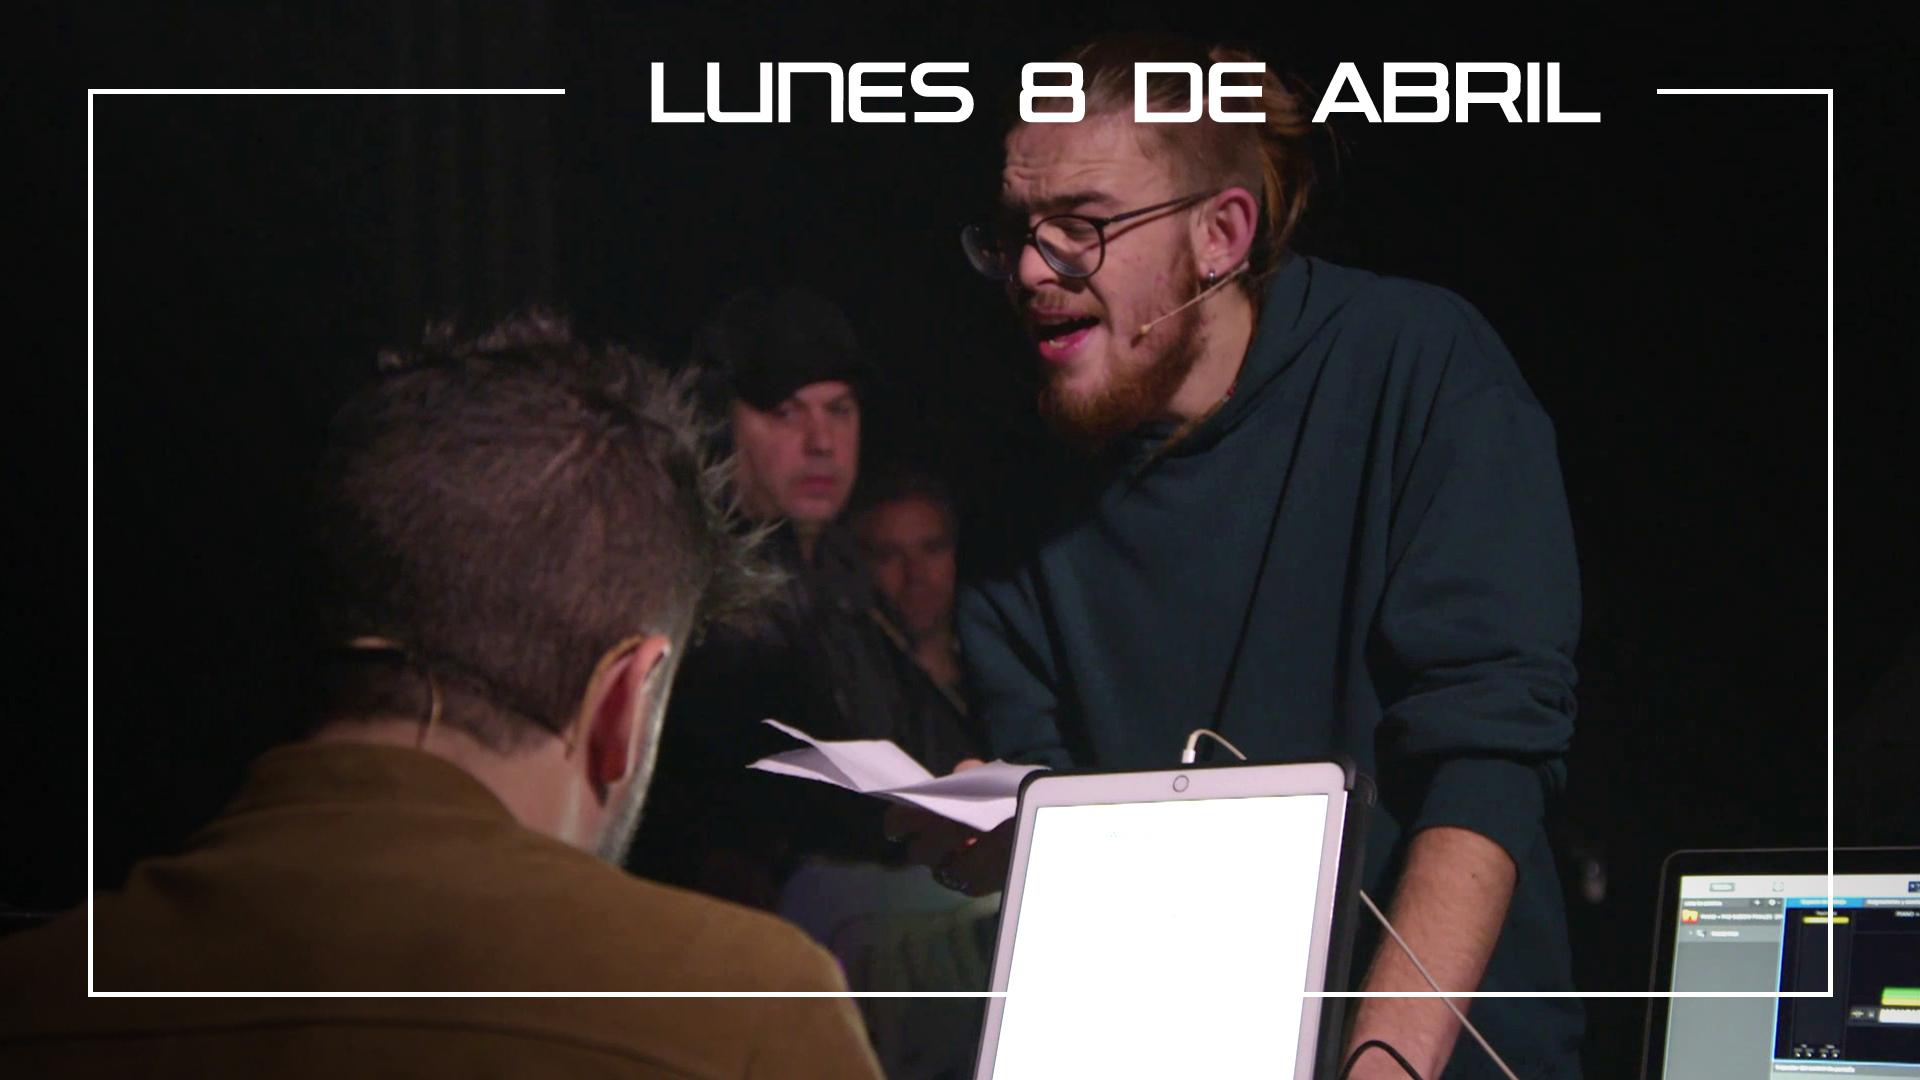 Lunes 8 de abril Andrés Martín ensaya con Pablo López en plató 'When a man loves a woman'